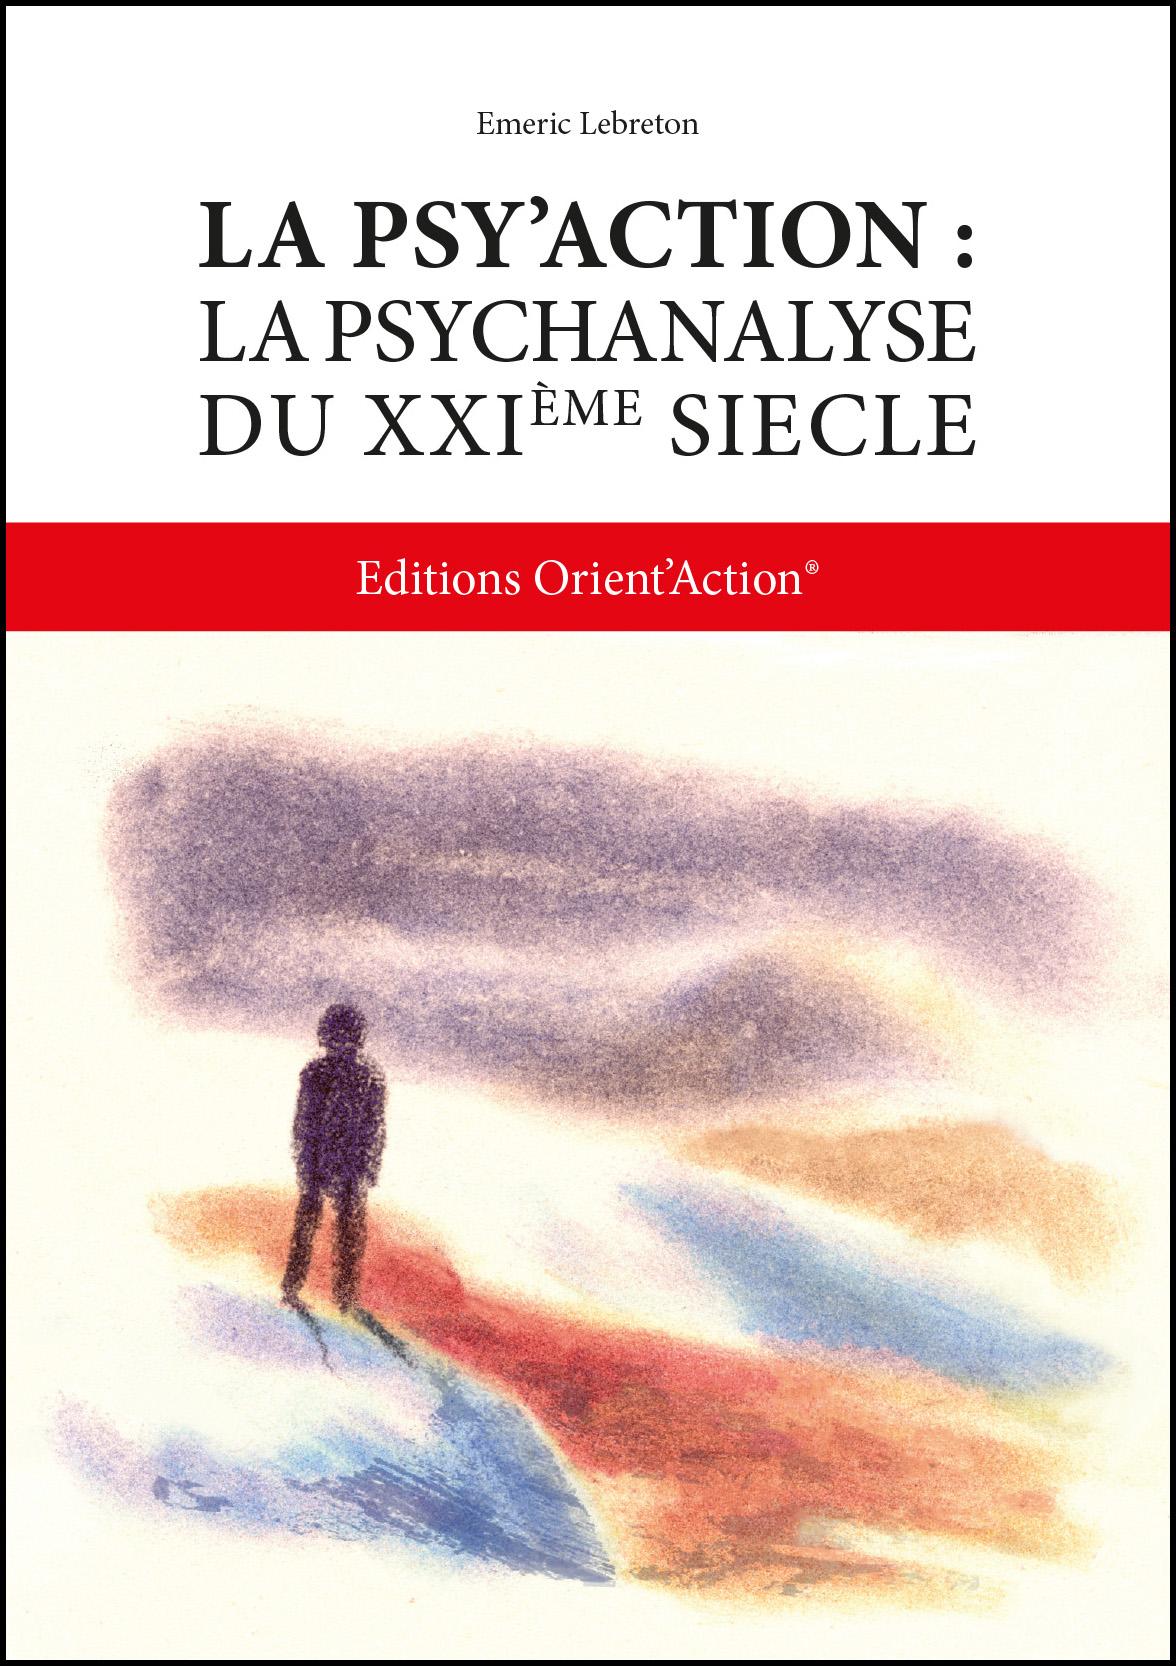 Livre : Psy'Action, la psychanalyse du XXIème siècle